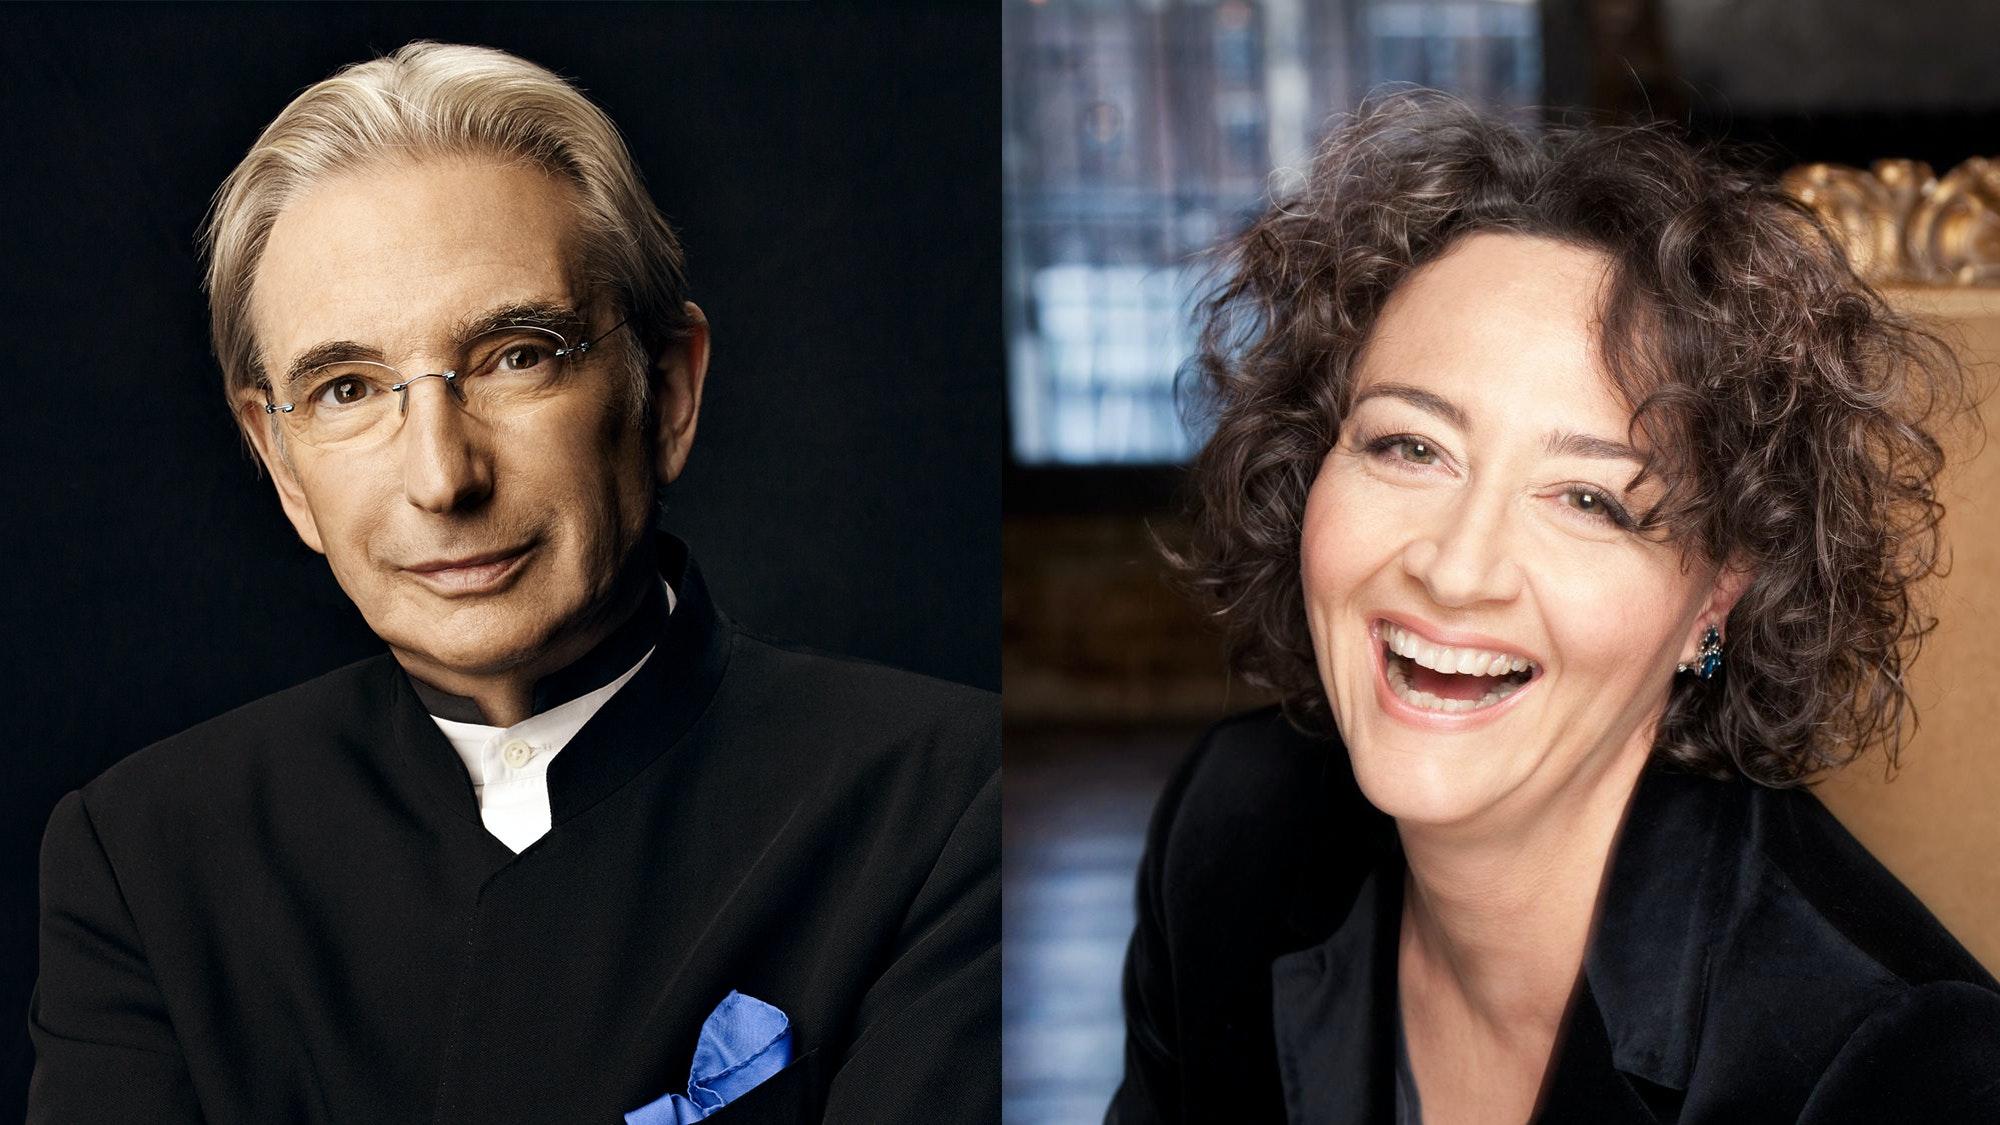 Michael Tilson Thomas conducts Mahler's Symphony No. 3 – With Nathalie Stutzmann